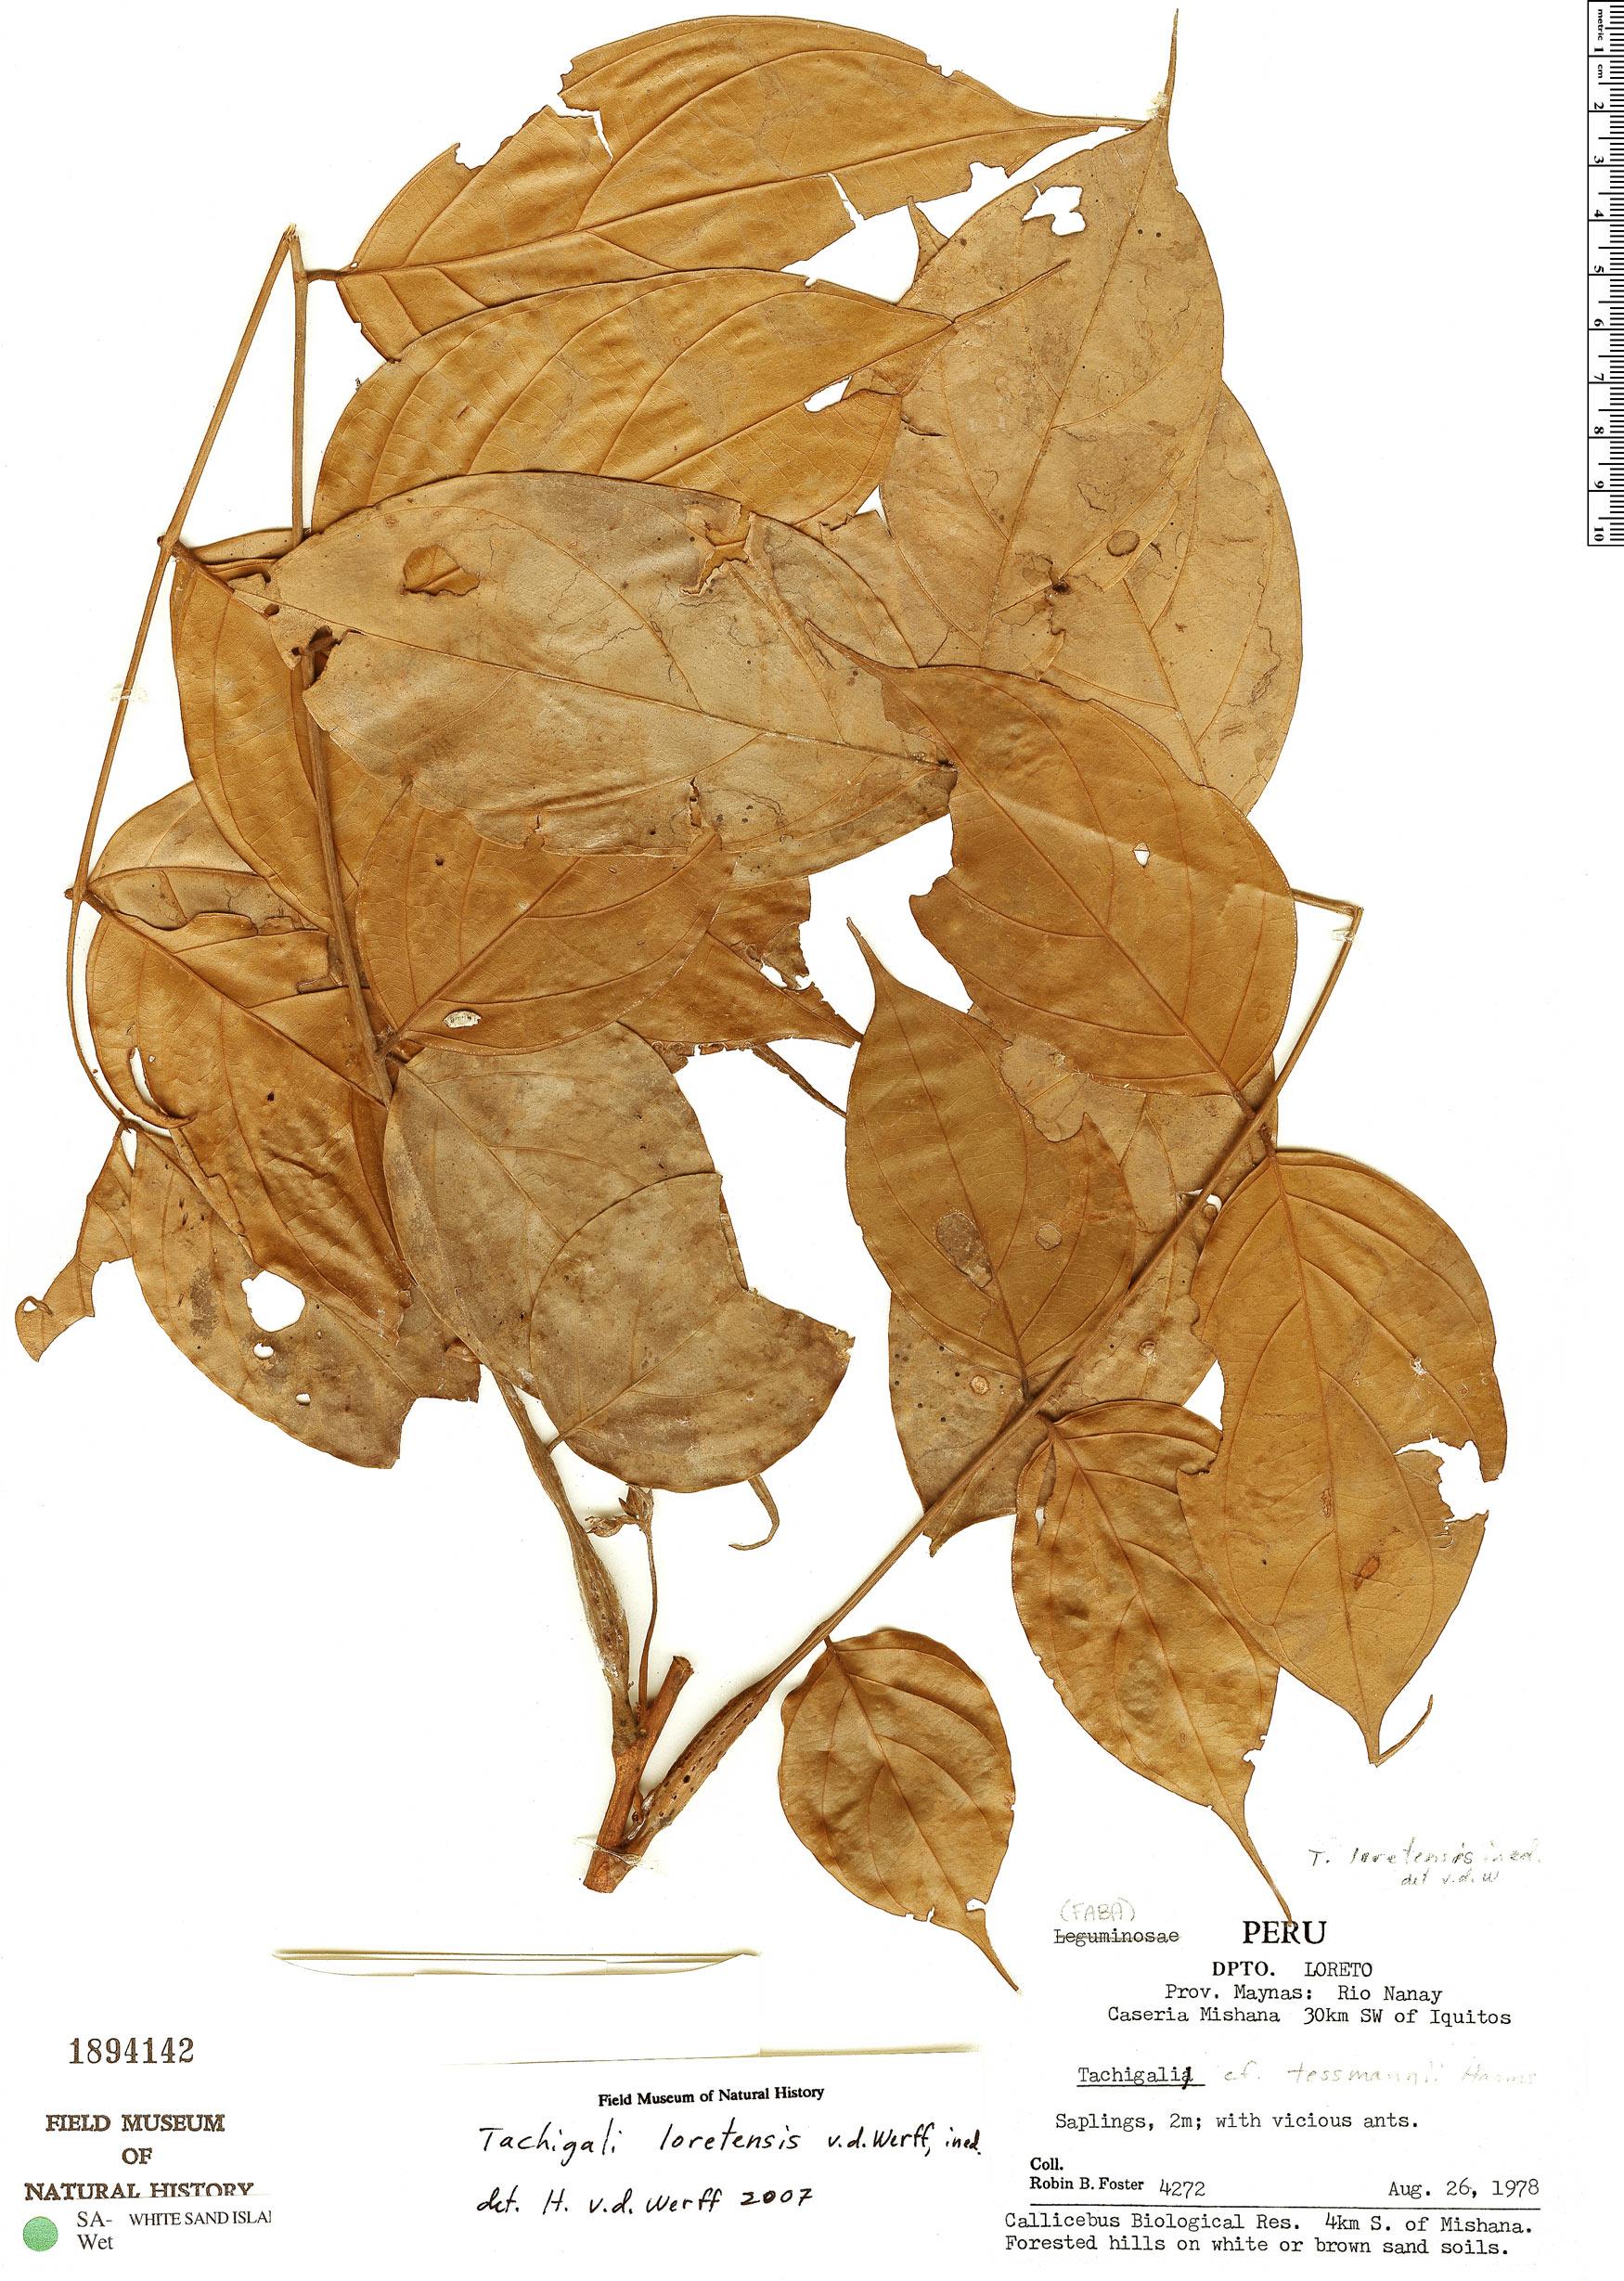 Espécimen: Tachigali loretensis